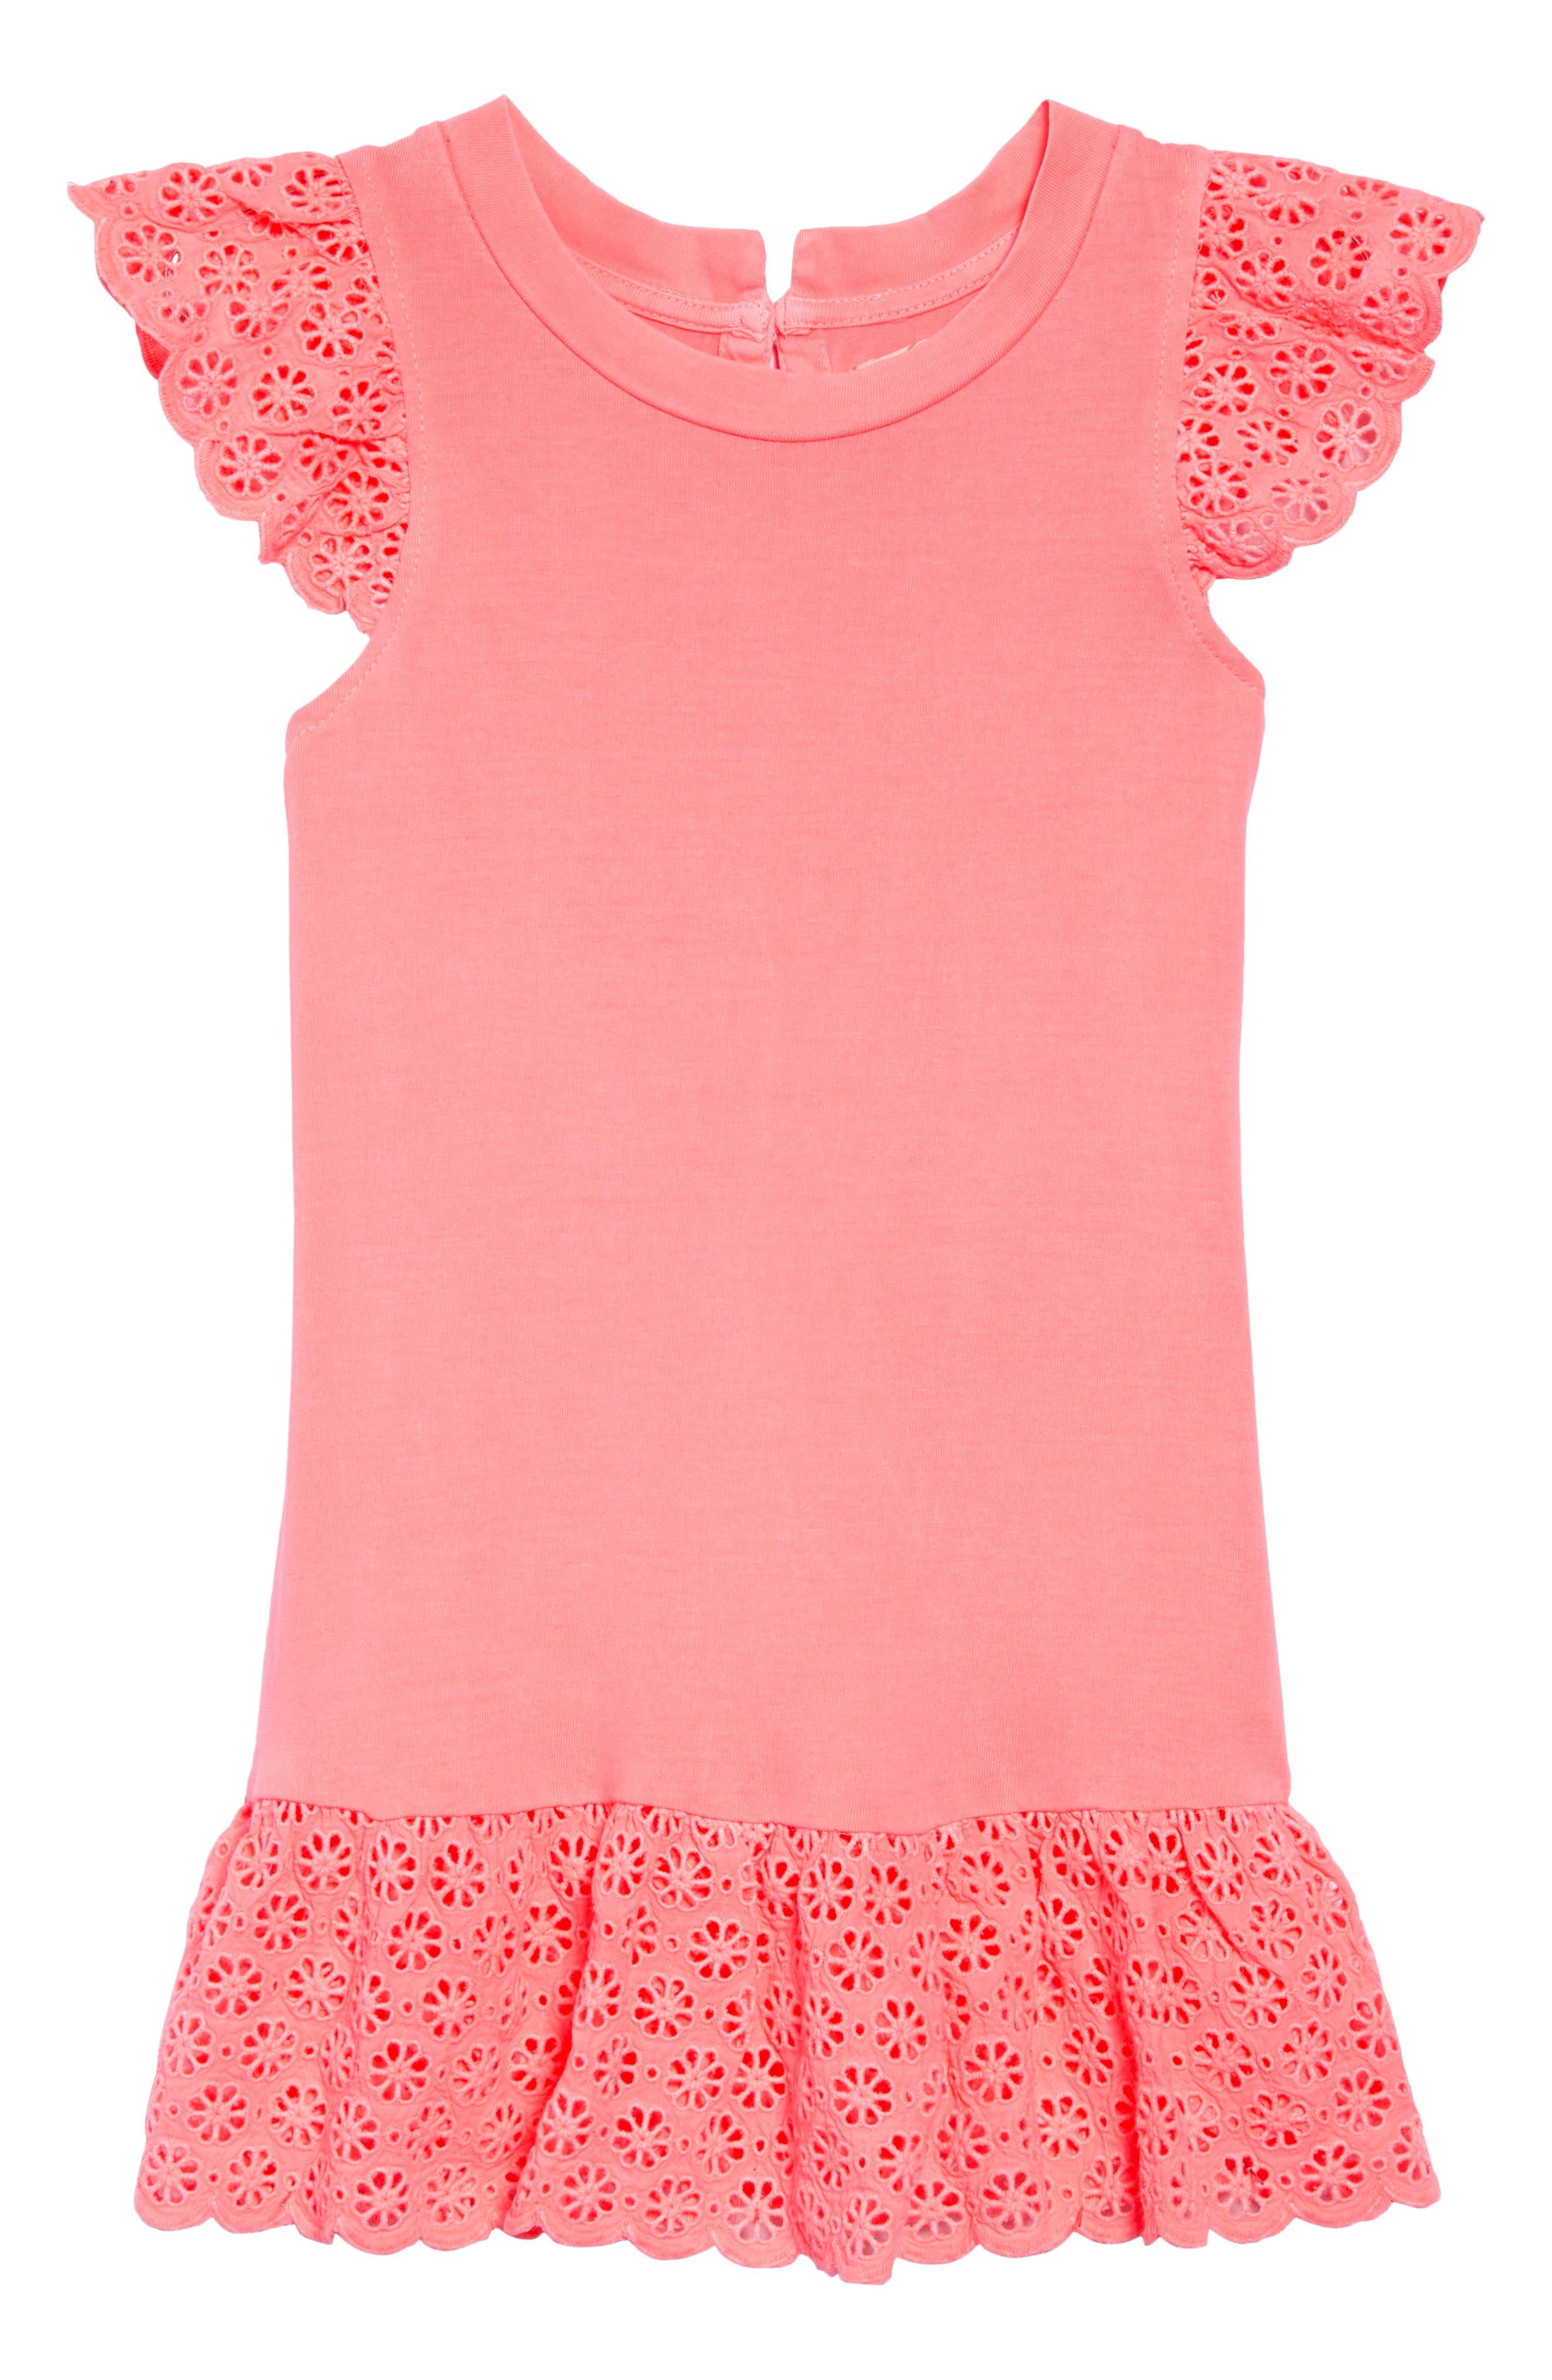 Ashley Dress,                         Main,                         color, Neon Coral